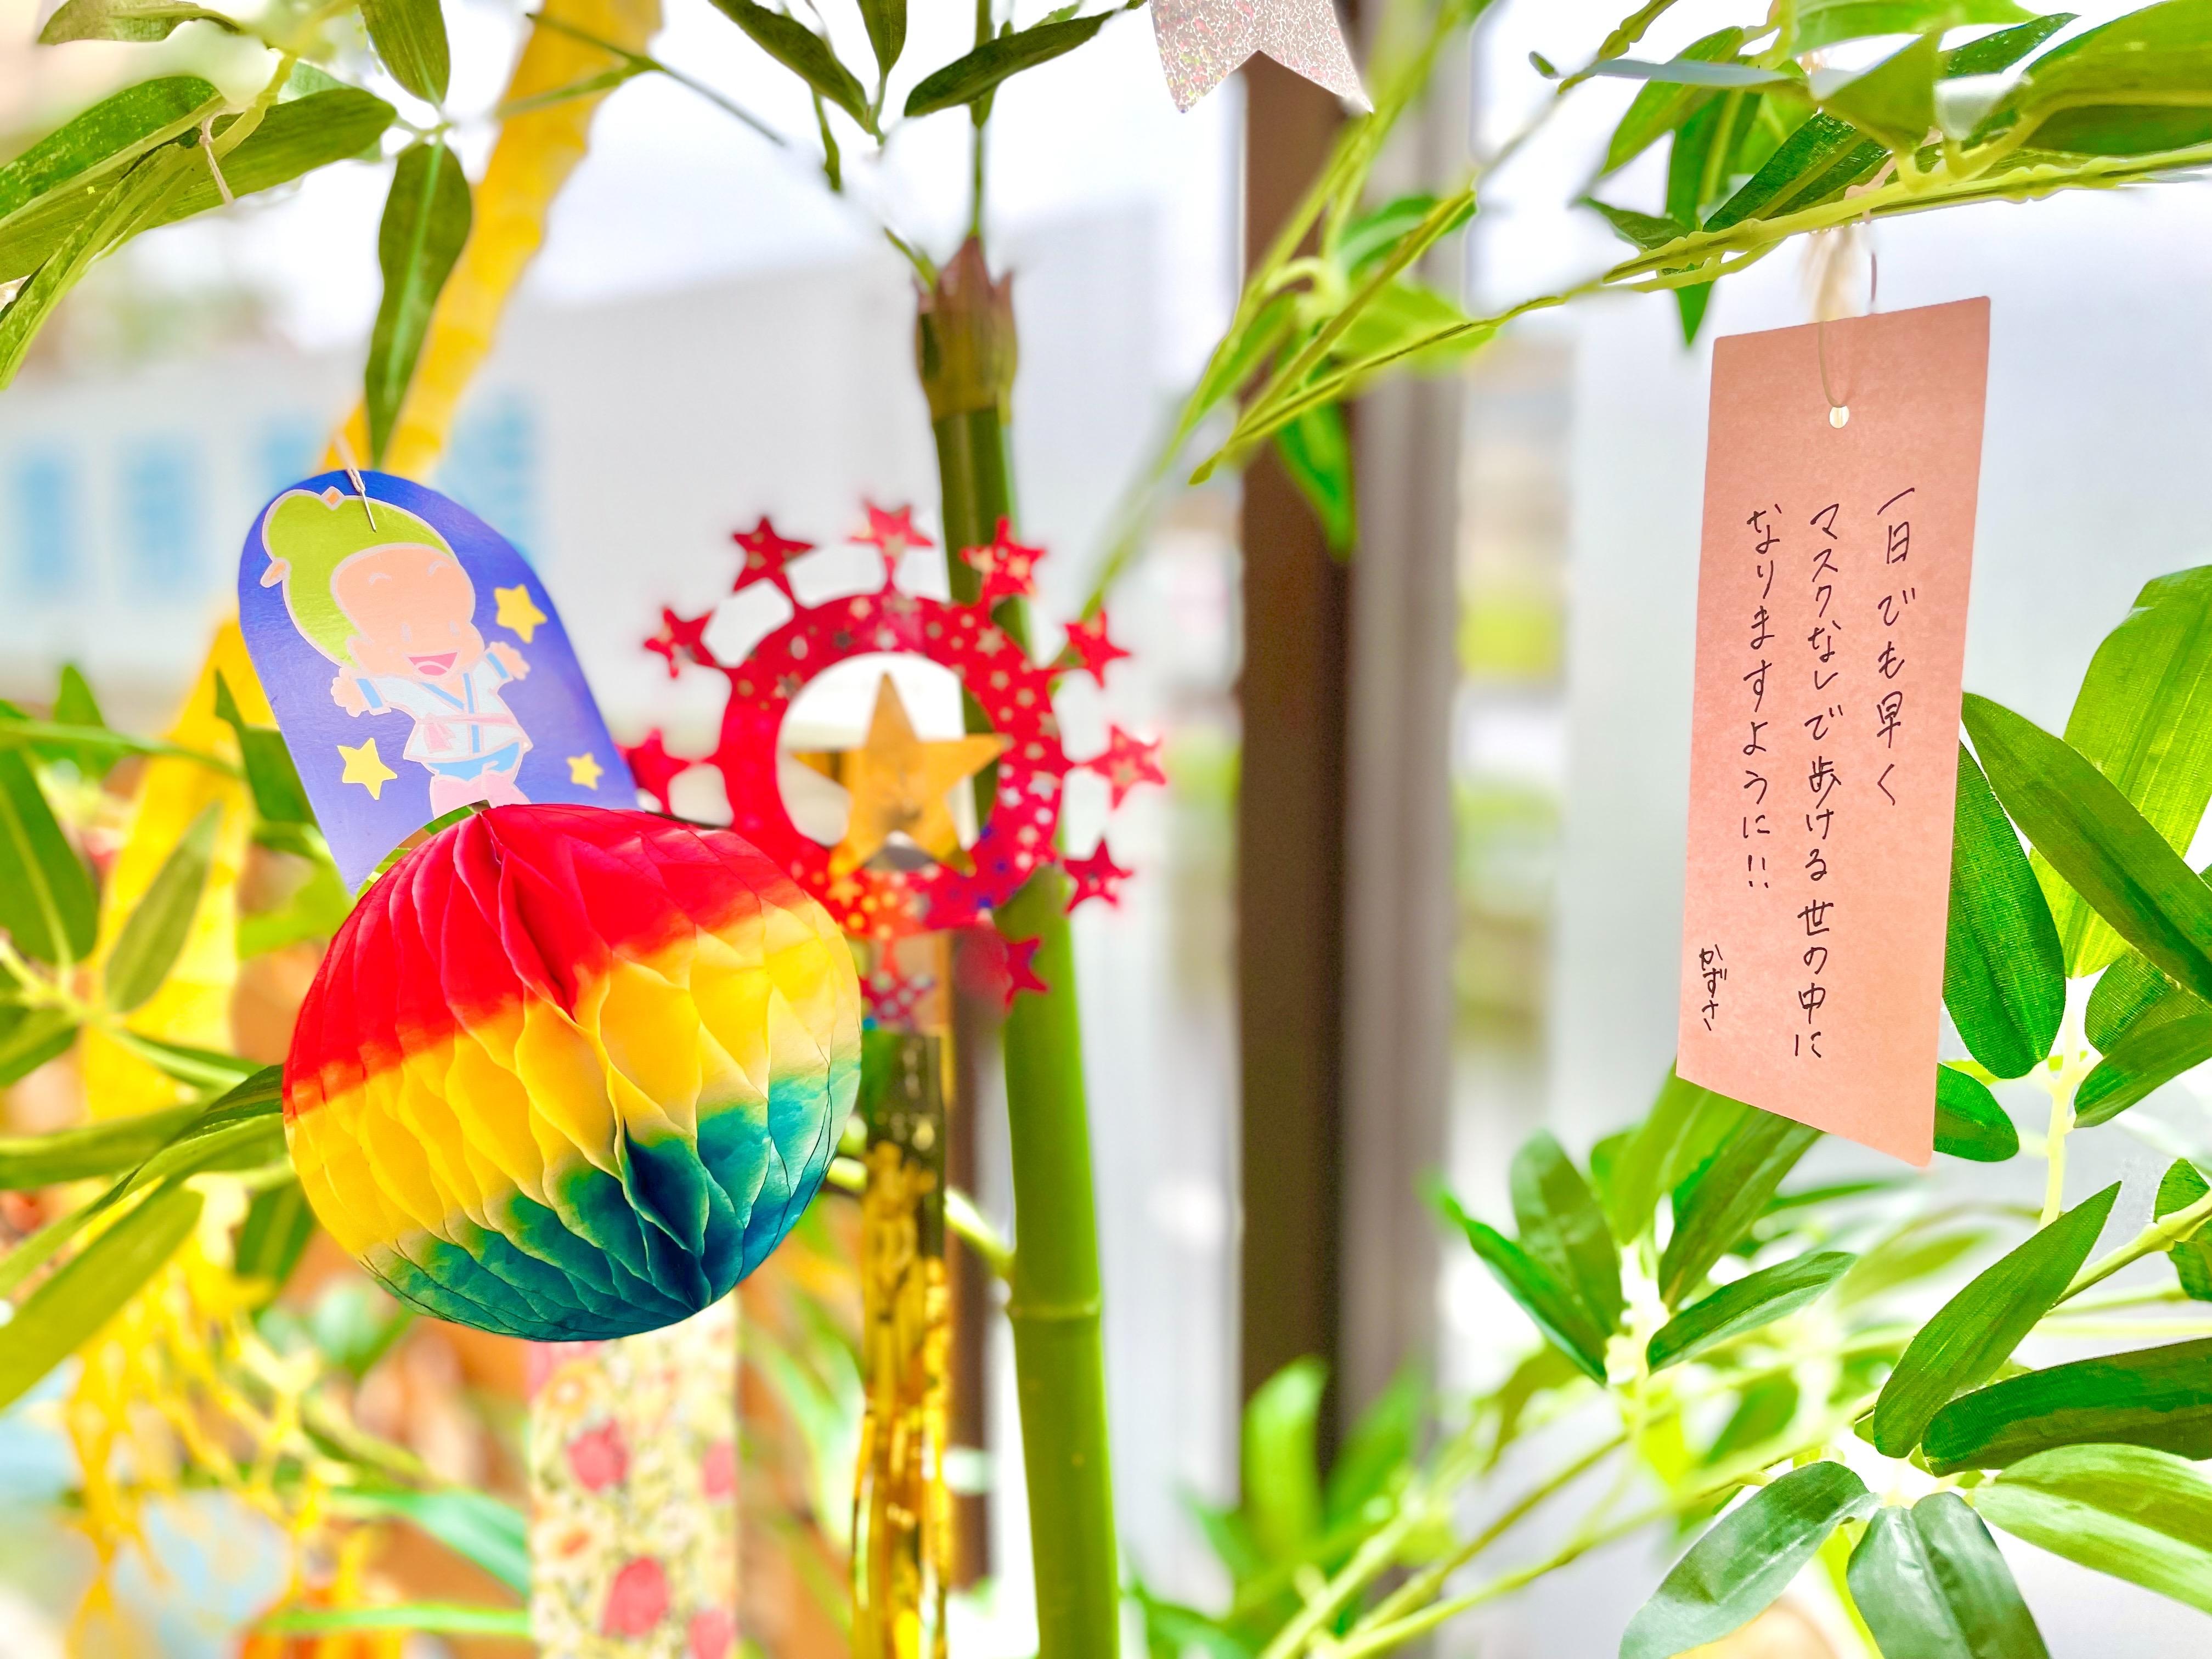 http://www.horikawaseikotu.com/img/S__6201370.jpeg